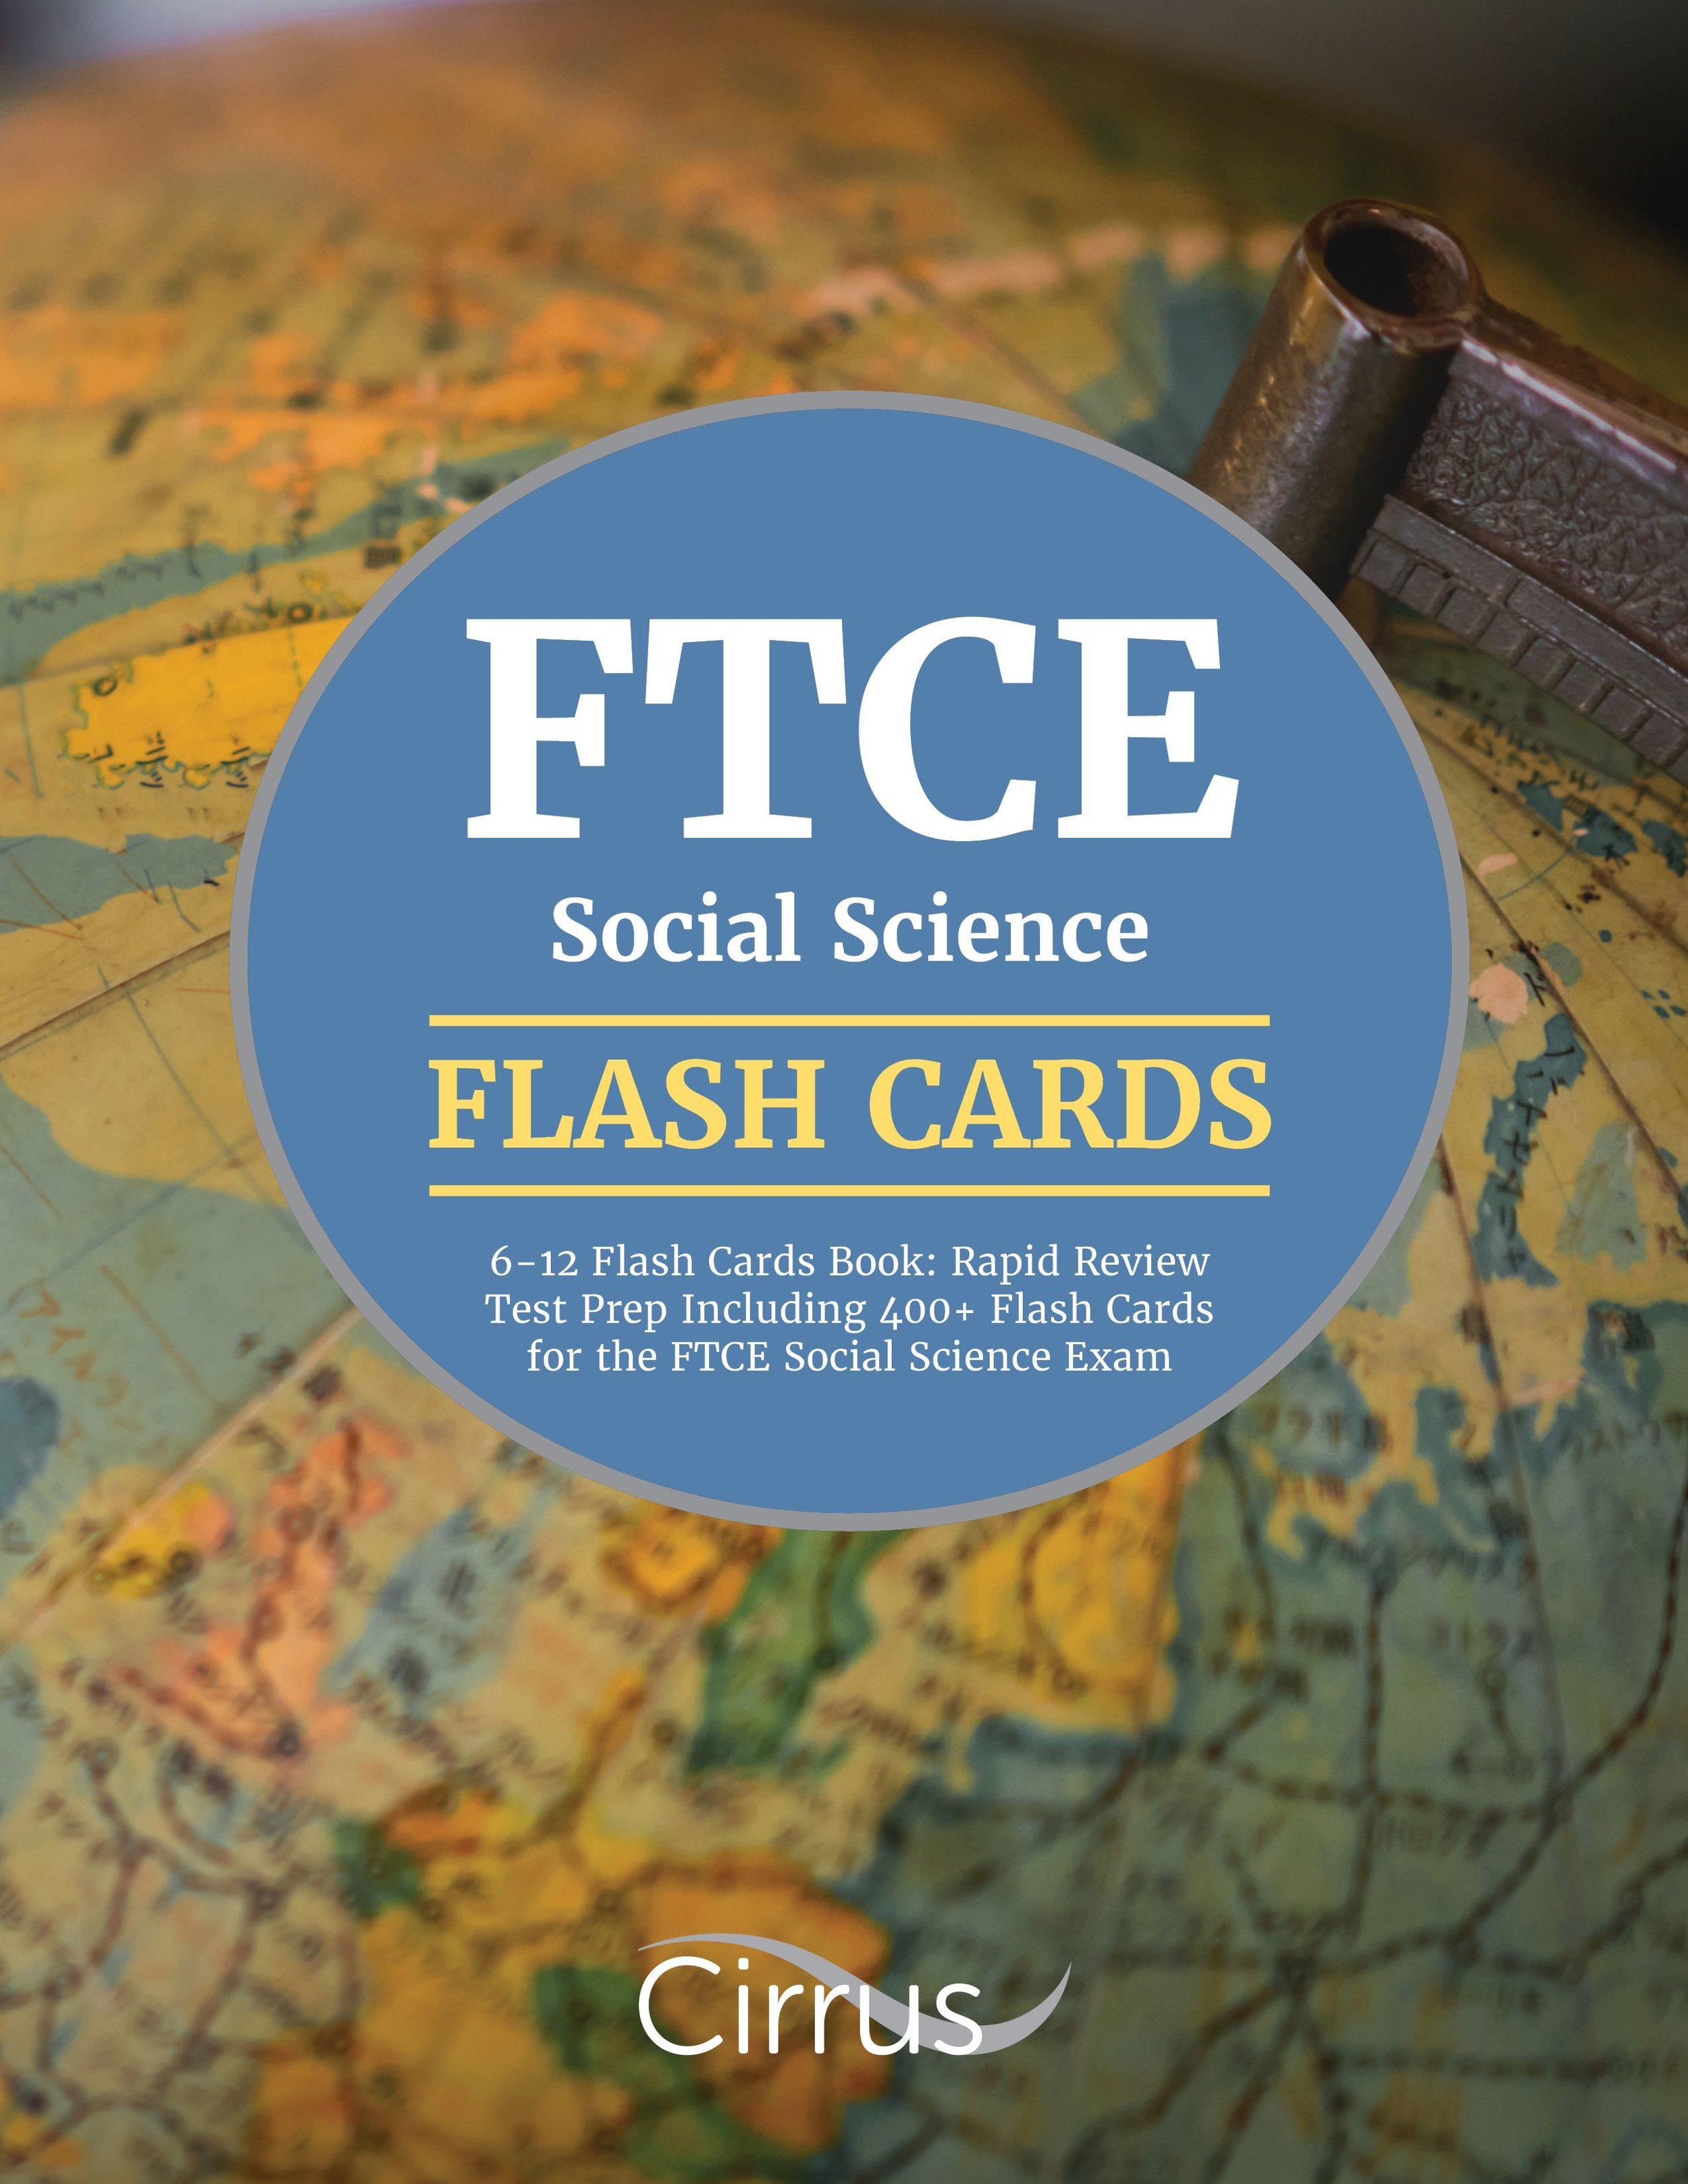 FTCE_FC_cover_website-compressor (1).jpg